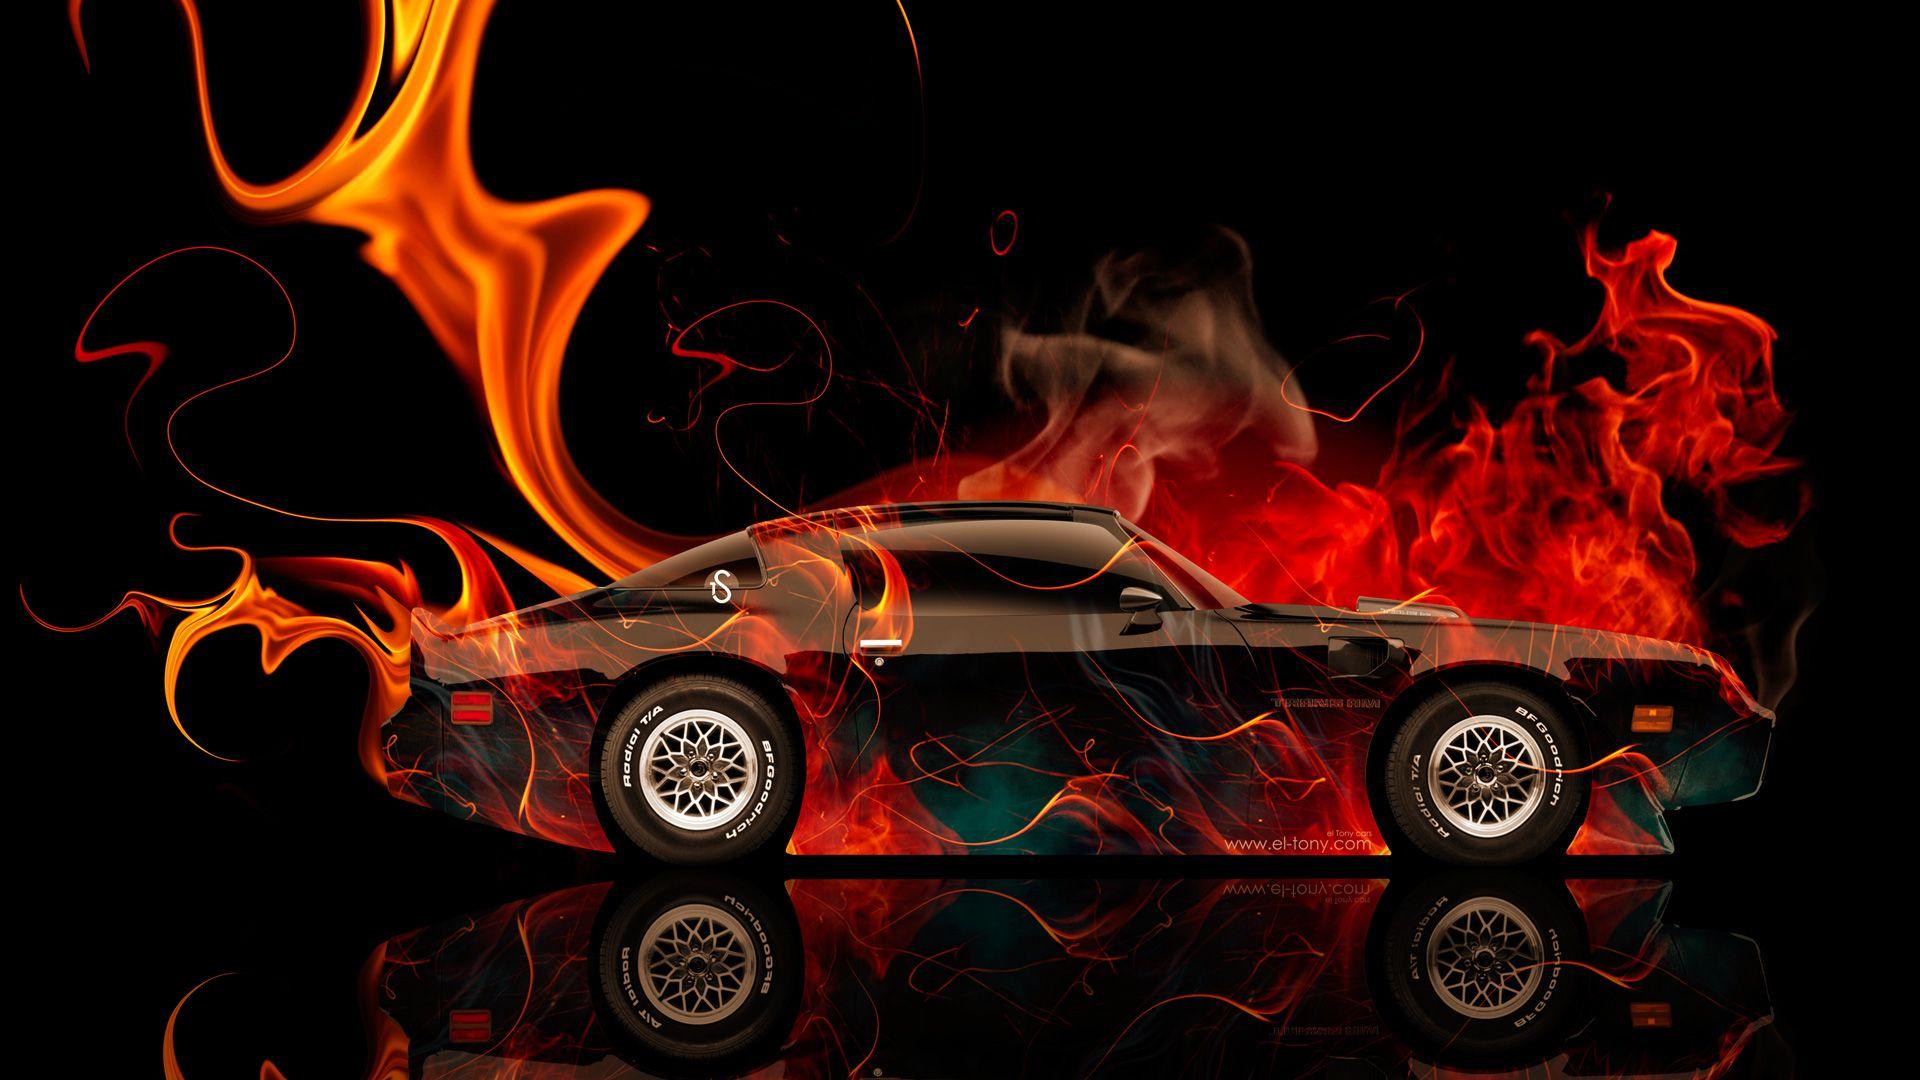 Lamborghini aventador side fire abstract car 2014 hd wallpapers design - Pontiac Firebird Side Fire Abstract Car 2014 Hd